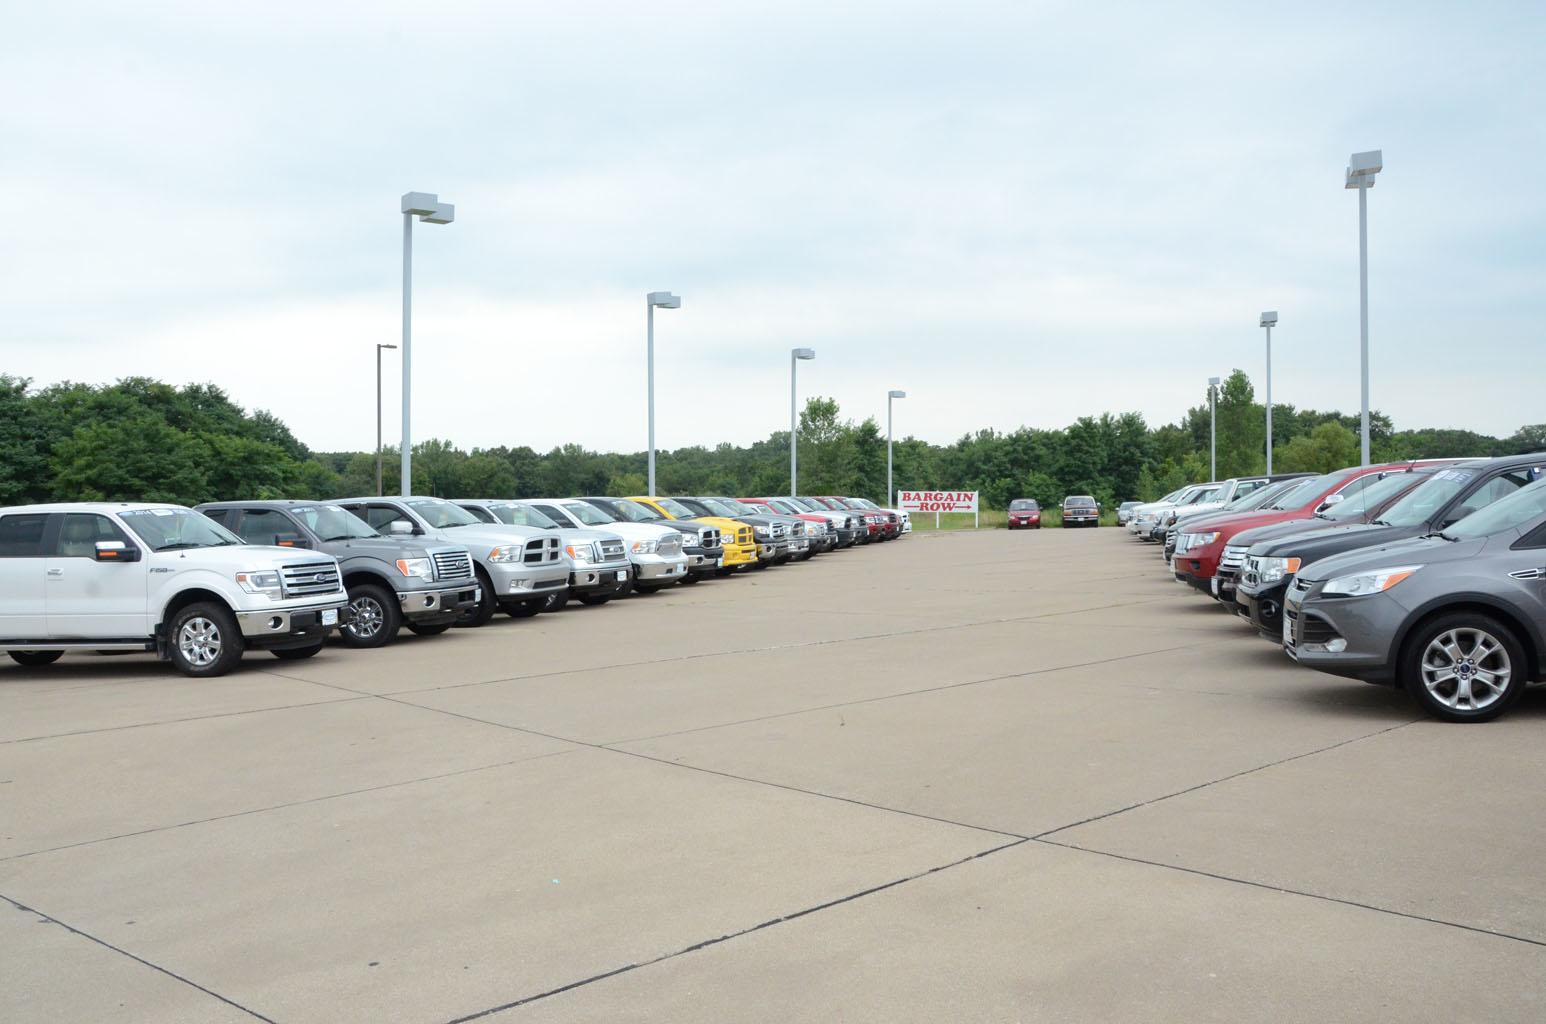 Kriegers Used Cars Muscatine Iowa